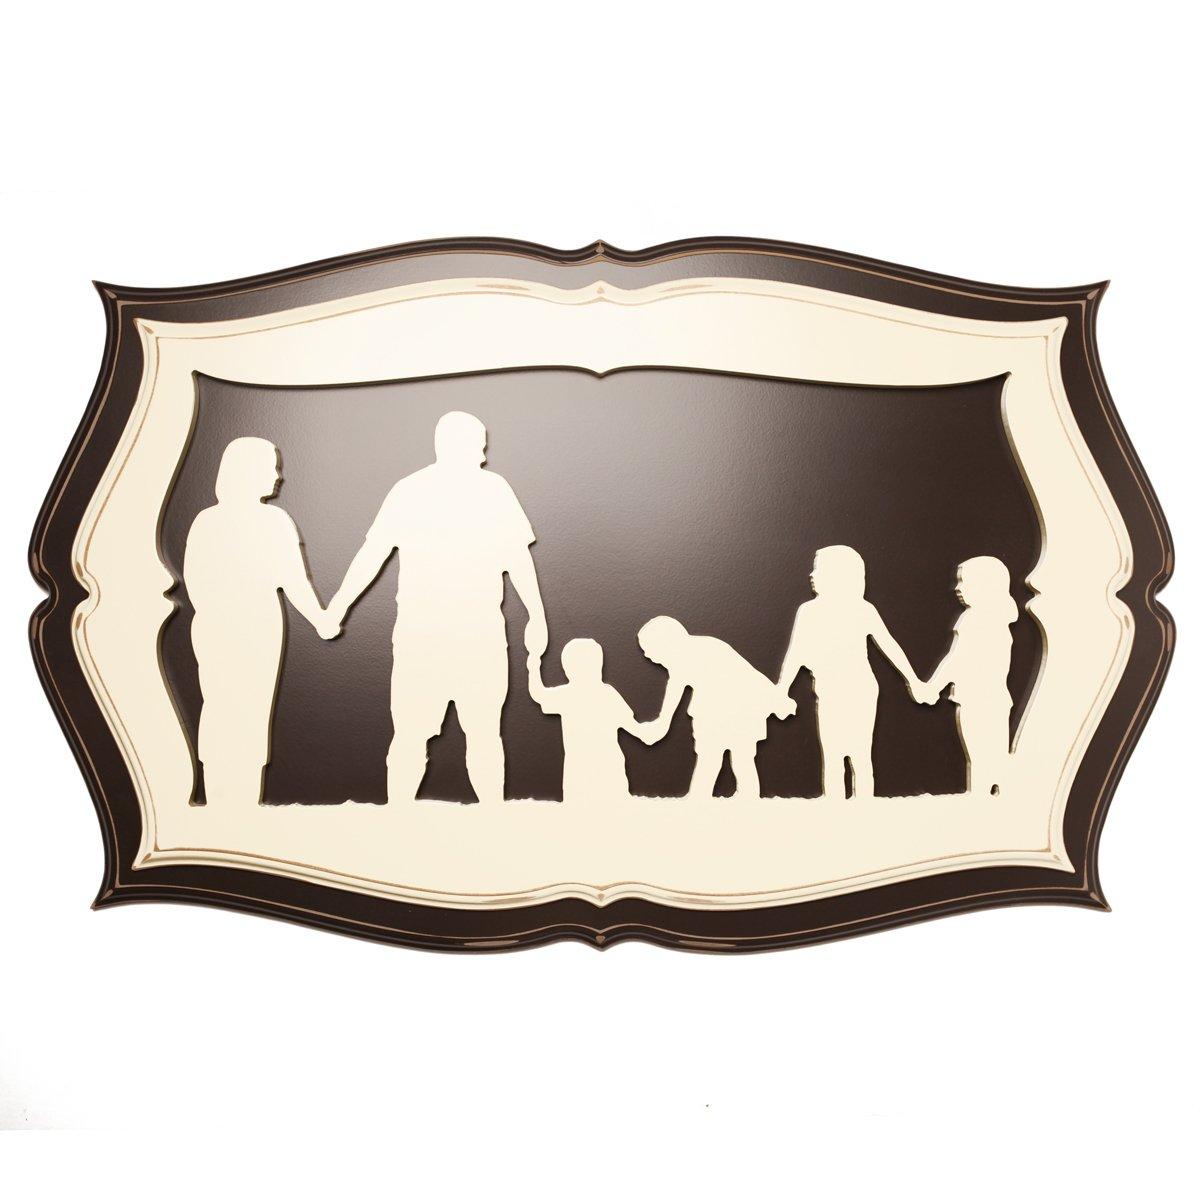 1200x1200 Family Silhouette